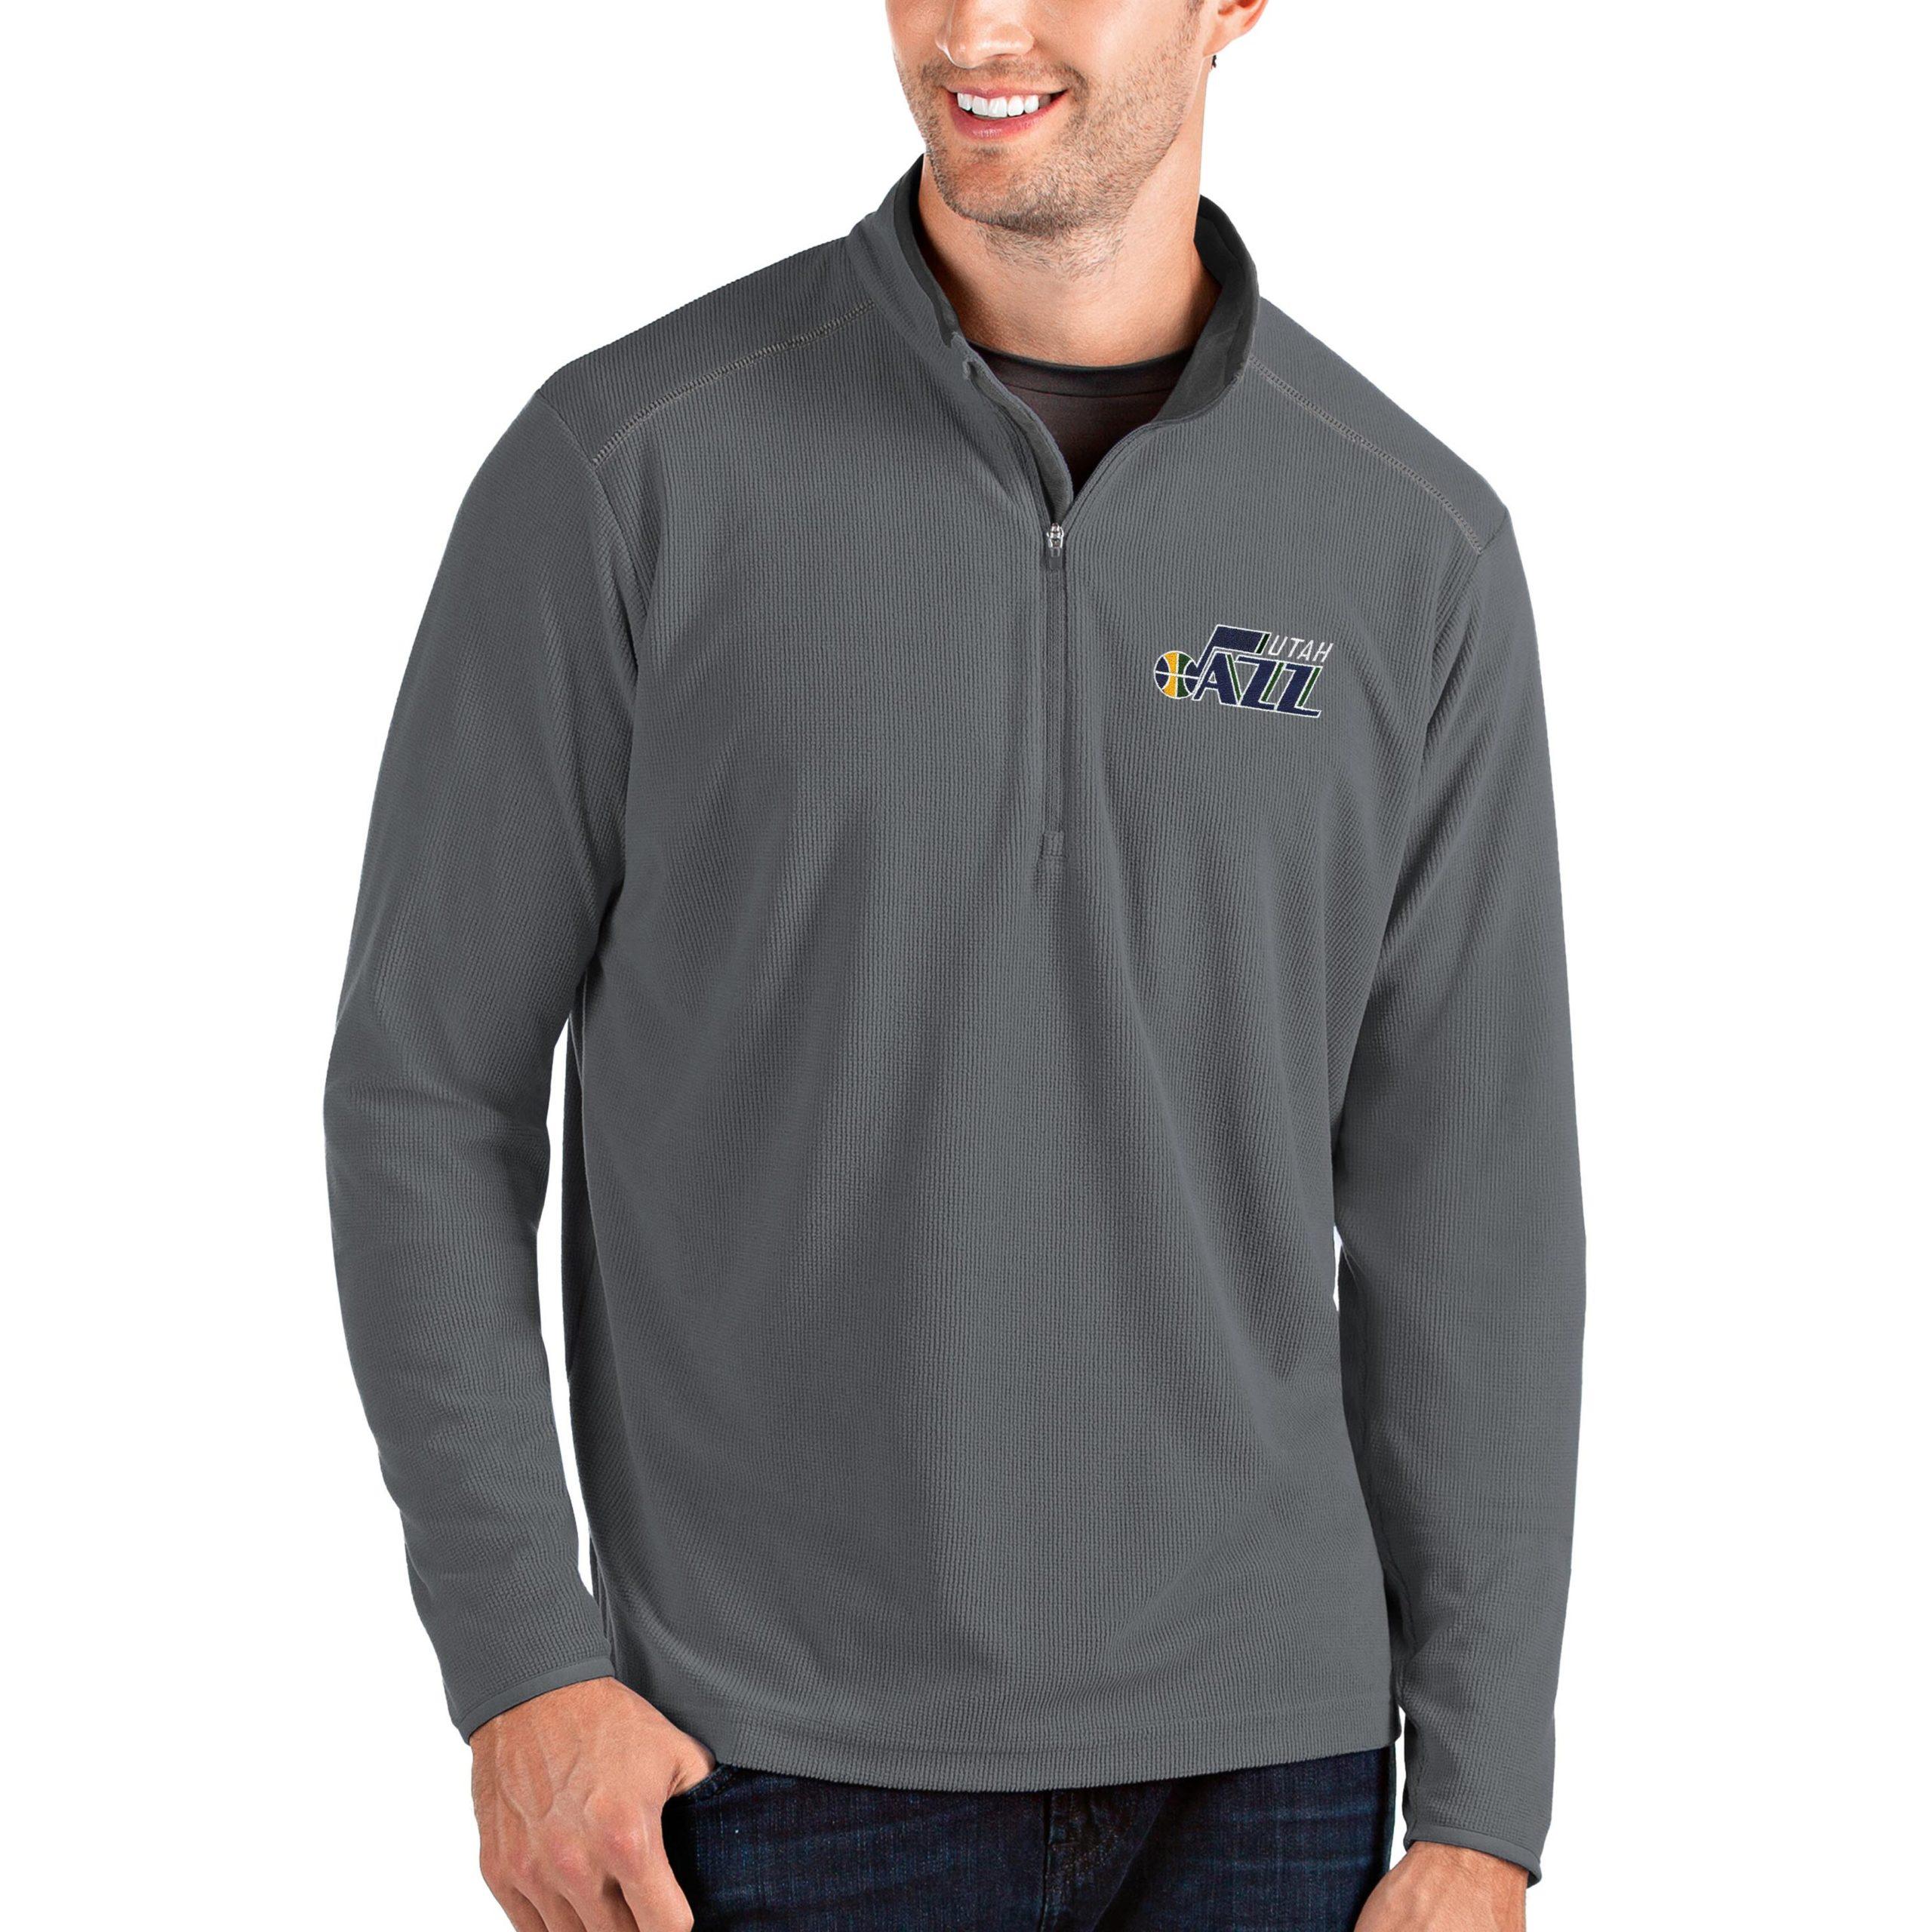 Utah Jazz Antigua Big & Tall Glacier Quarter-Zip Pullover Jacket - Gray/Gray